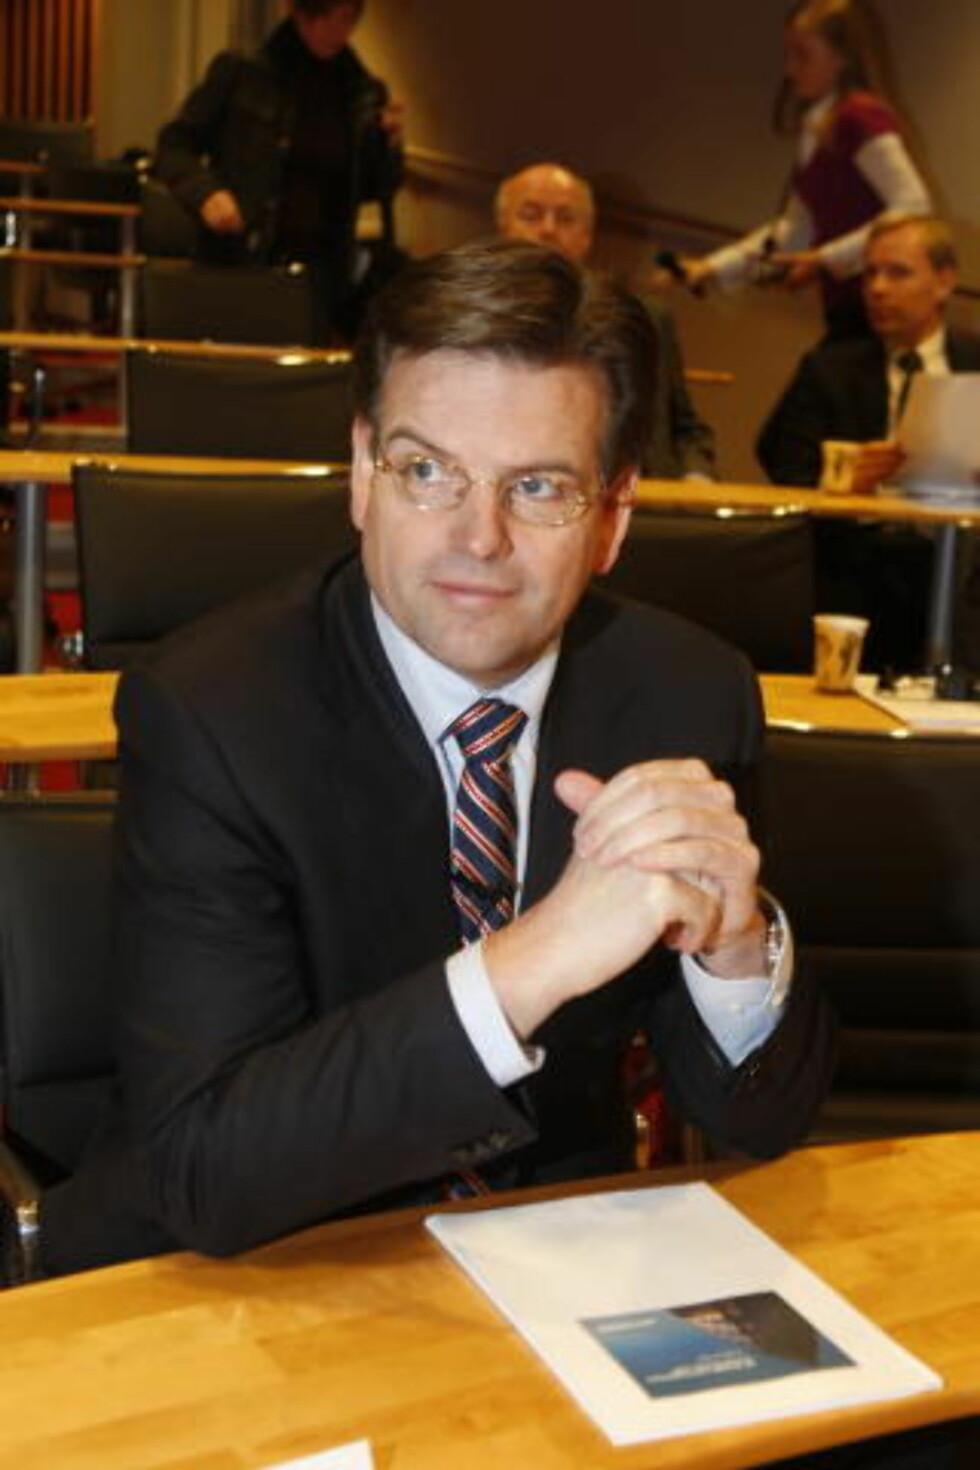 STYRELEDER: Martinus Brandal er styreleder i Aker Solutions. Foto: Terje Bendiksby / SCANPIX